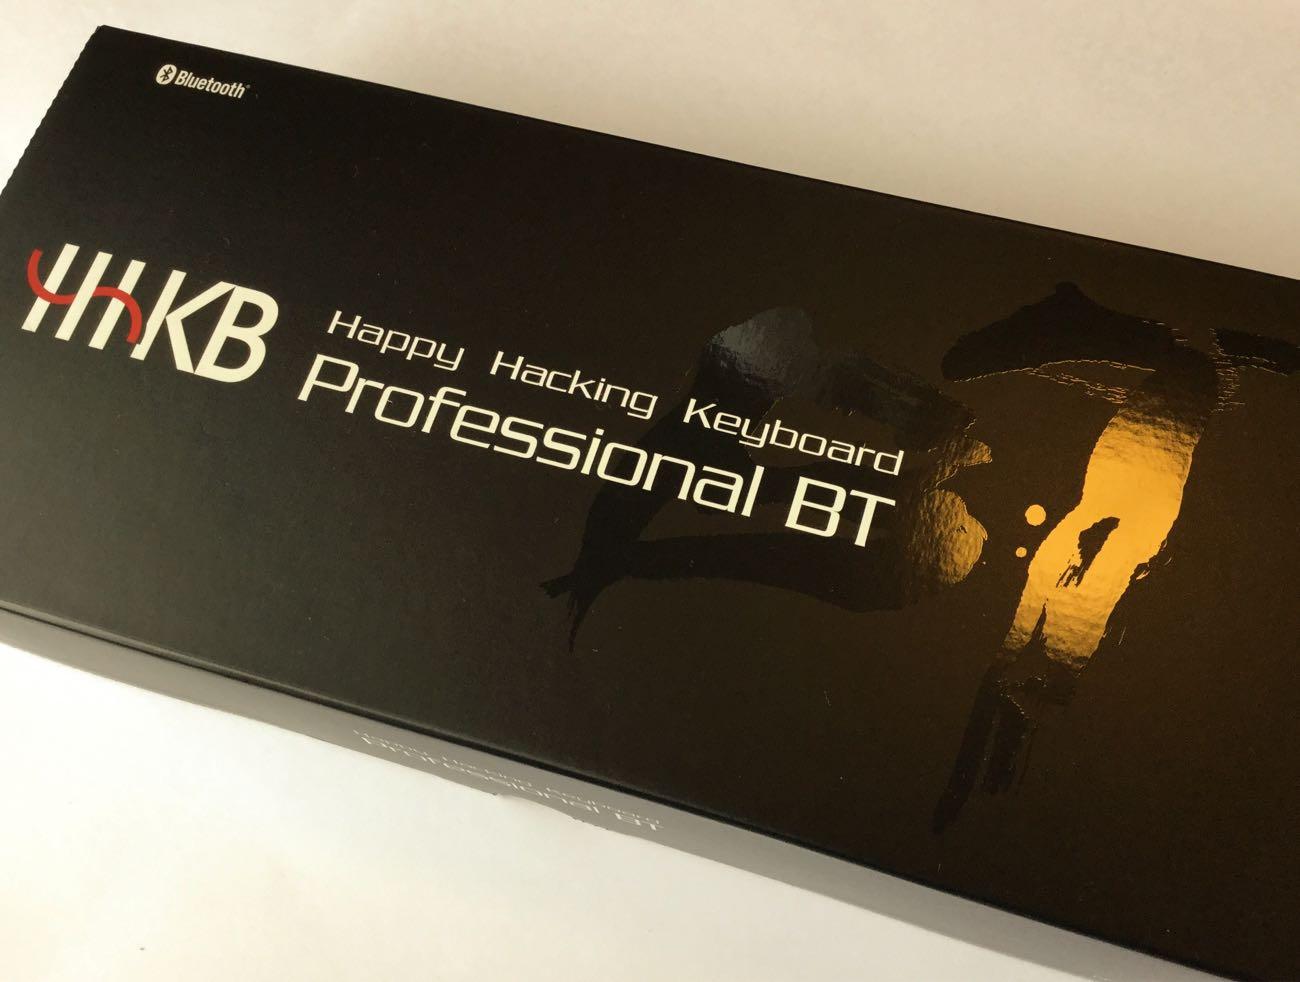 Happy Hacking Keyboard Professional BTの箱